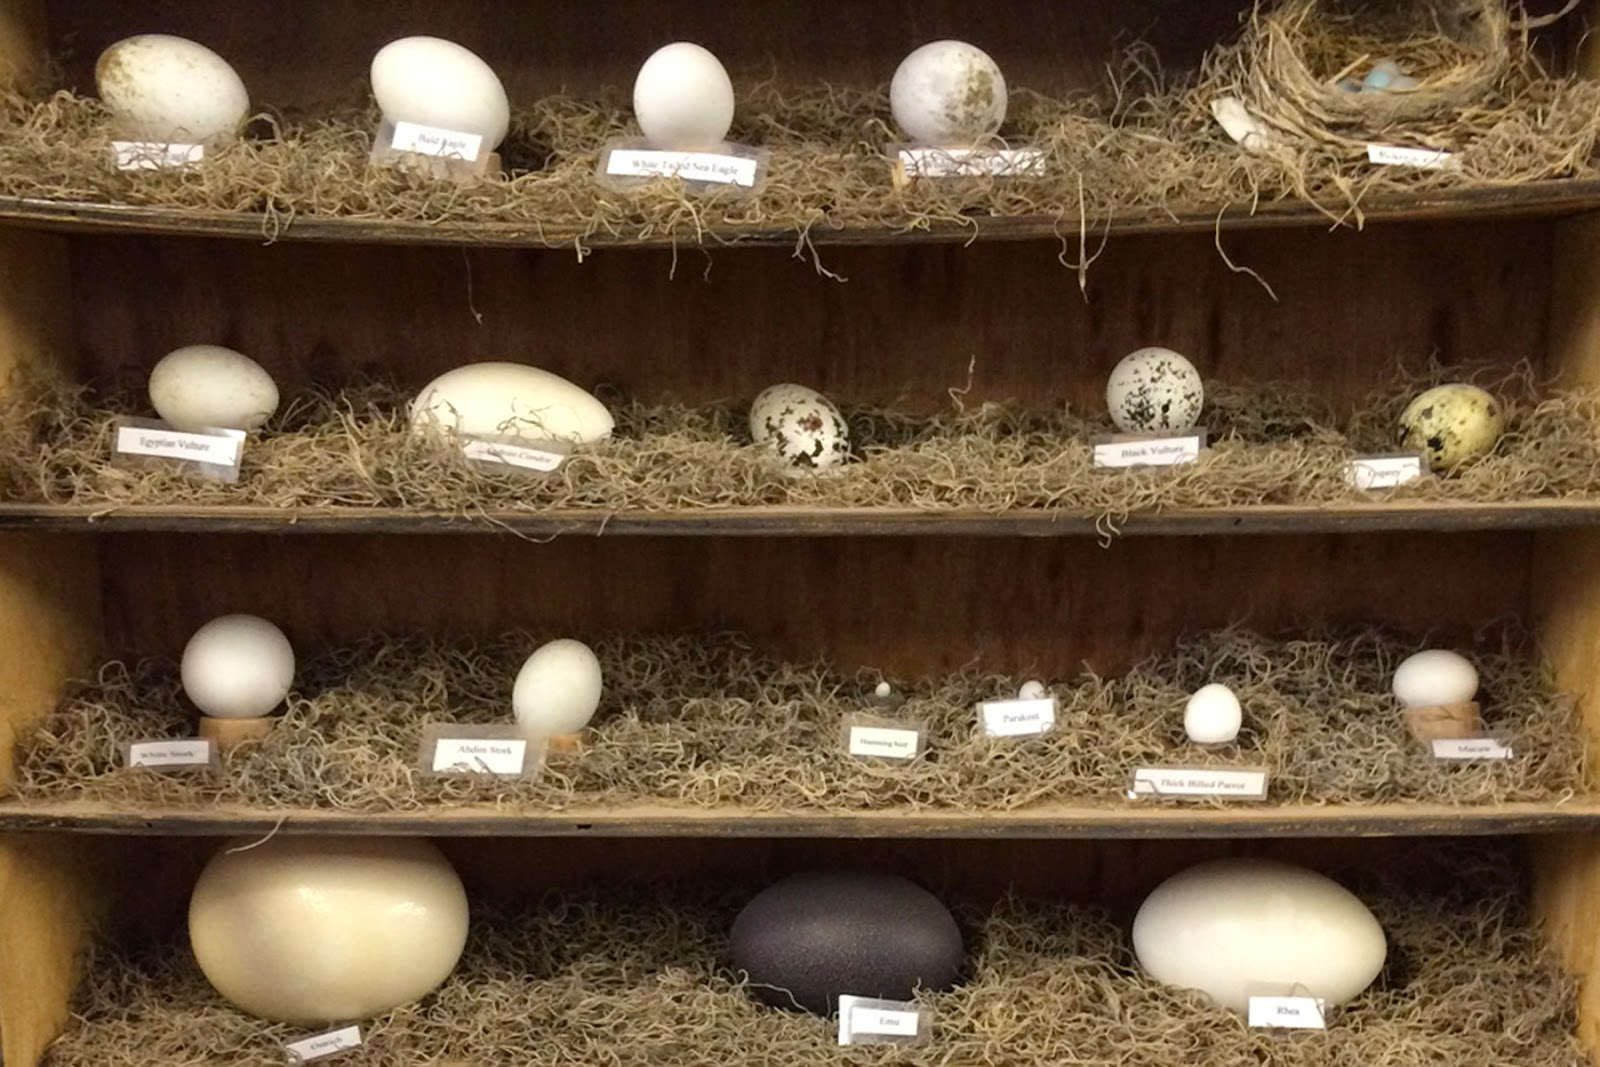 World Bird Sanctuary: What on earth is a Rhea?